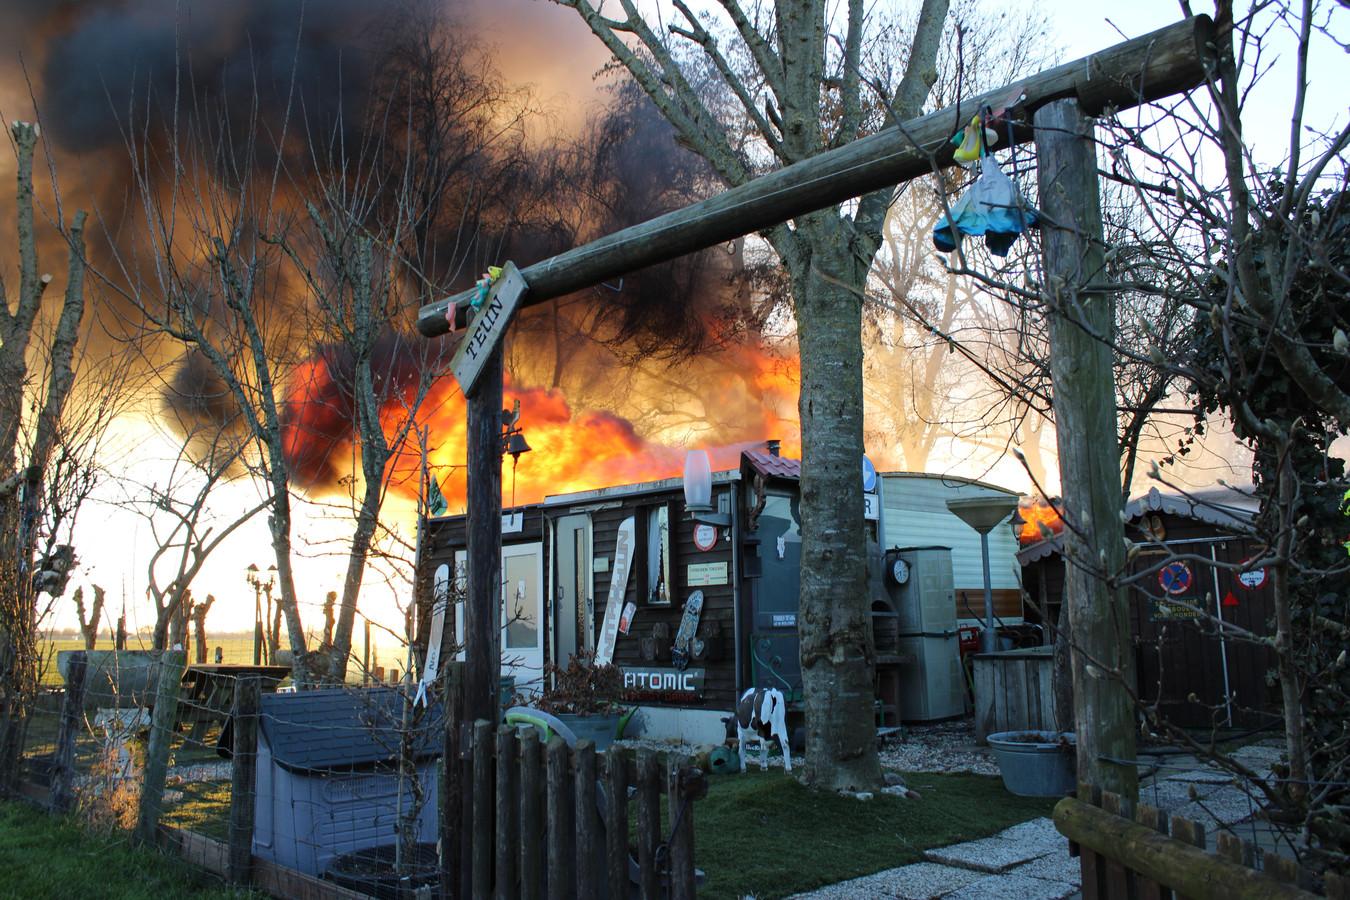 Op camping De Hollandse Boerderij brandden vrijdag twee chalets af.